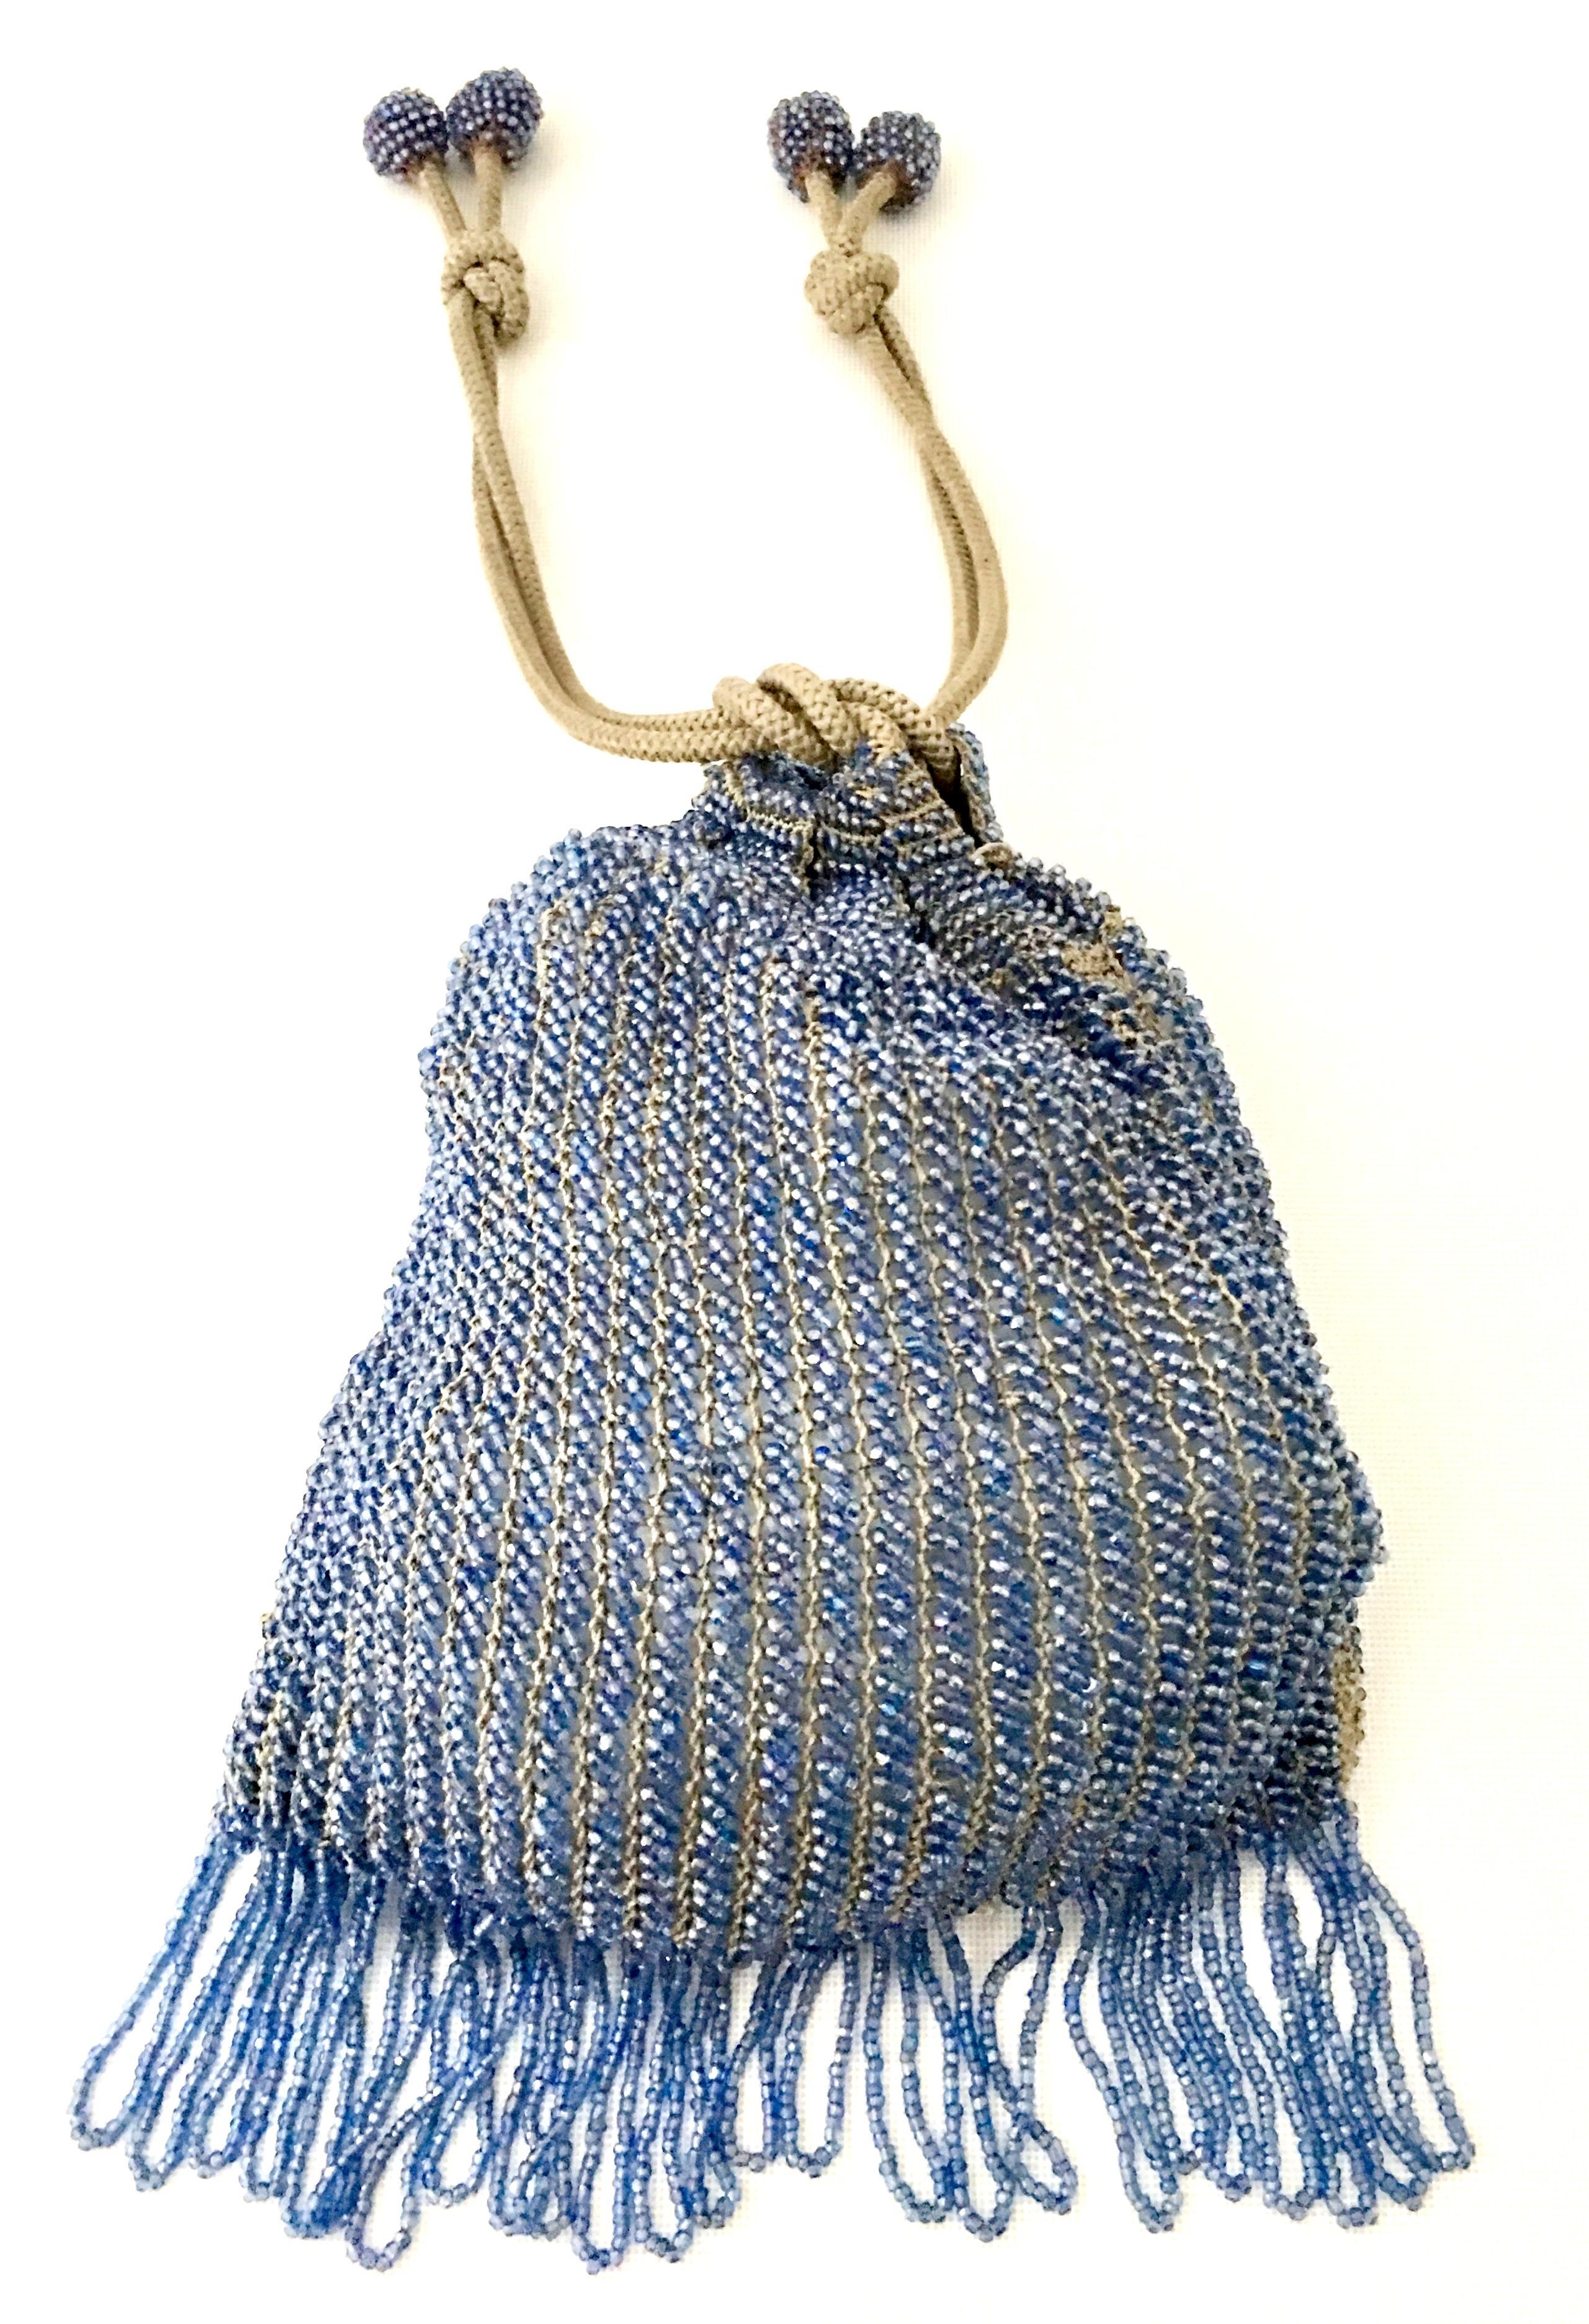 Antiques Antique Tan Geometric Crochet Knit Lime Green Bead Ball Handle Flapper Purse